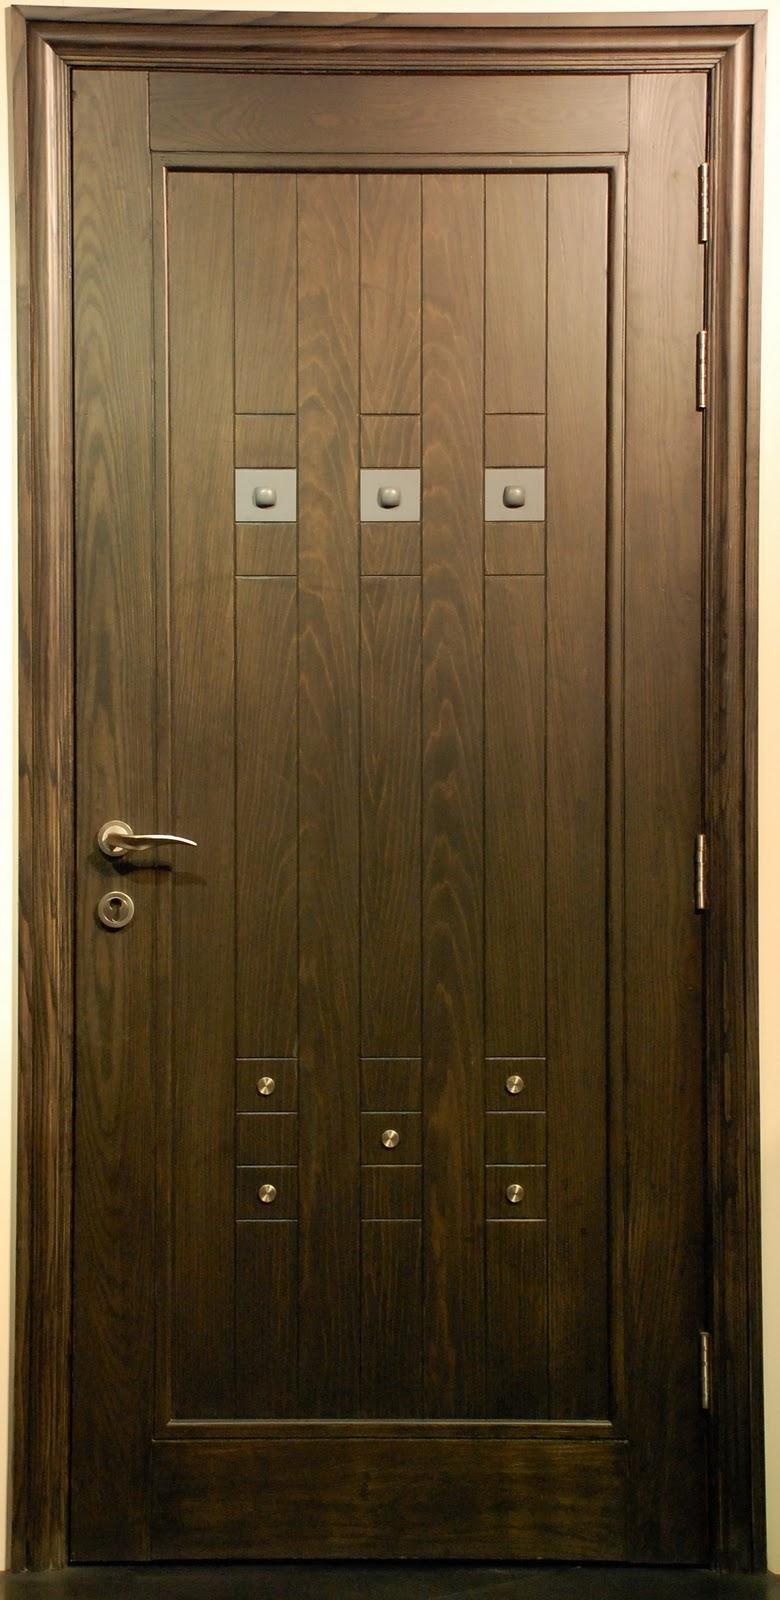 Dayar wooden front door hpd458 solid wood doors al habib panel - There Has Some Kind Of Door Solid Wood Semi Solid Veneer Engineer Door Which Make In These Wood Ash Accasia Beach Diyar